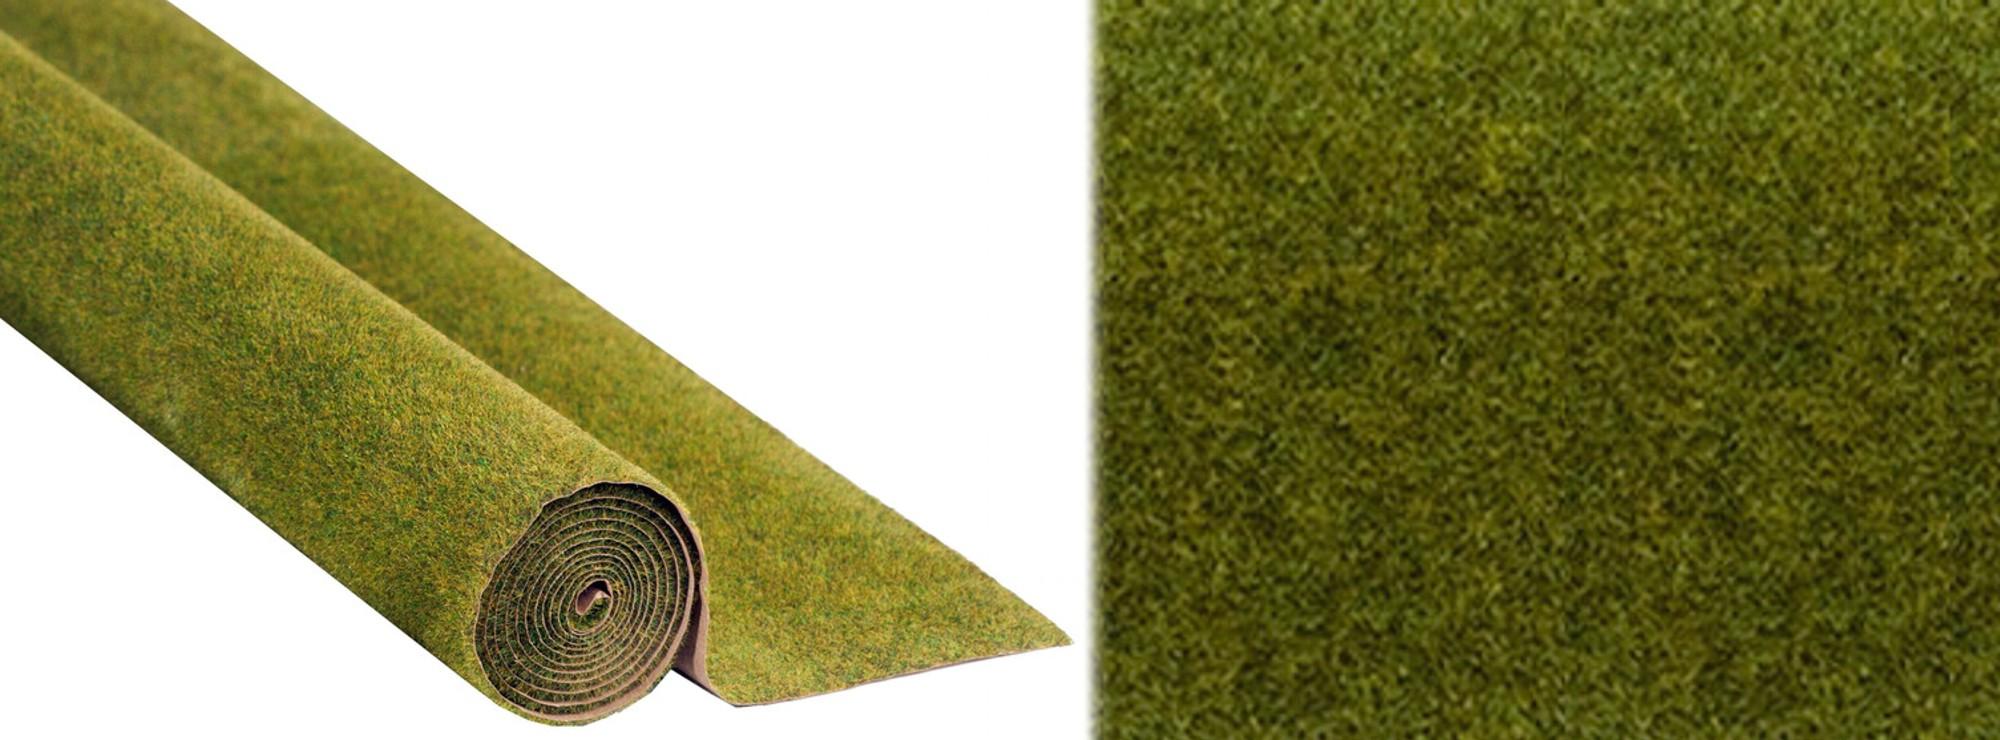 NOCH 00410 Natur+Wiesenmatte 12mm Frühling                               #55655